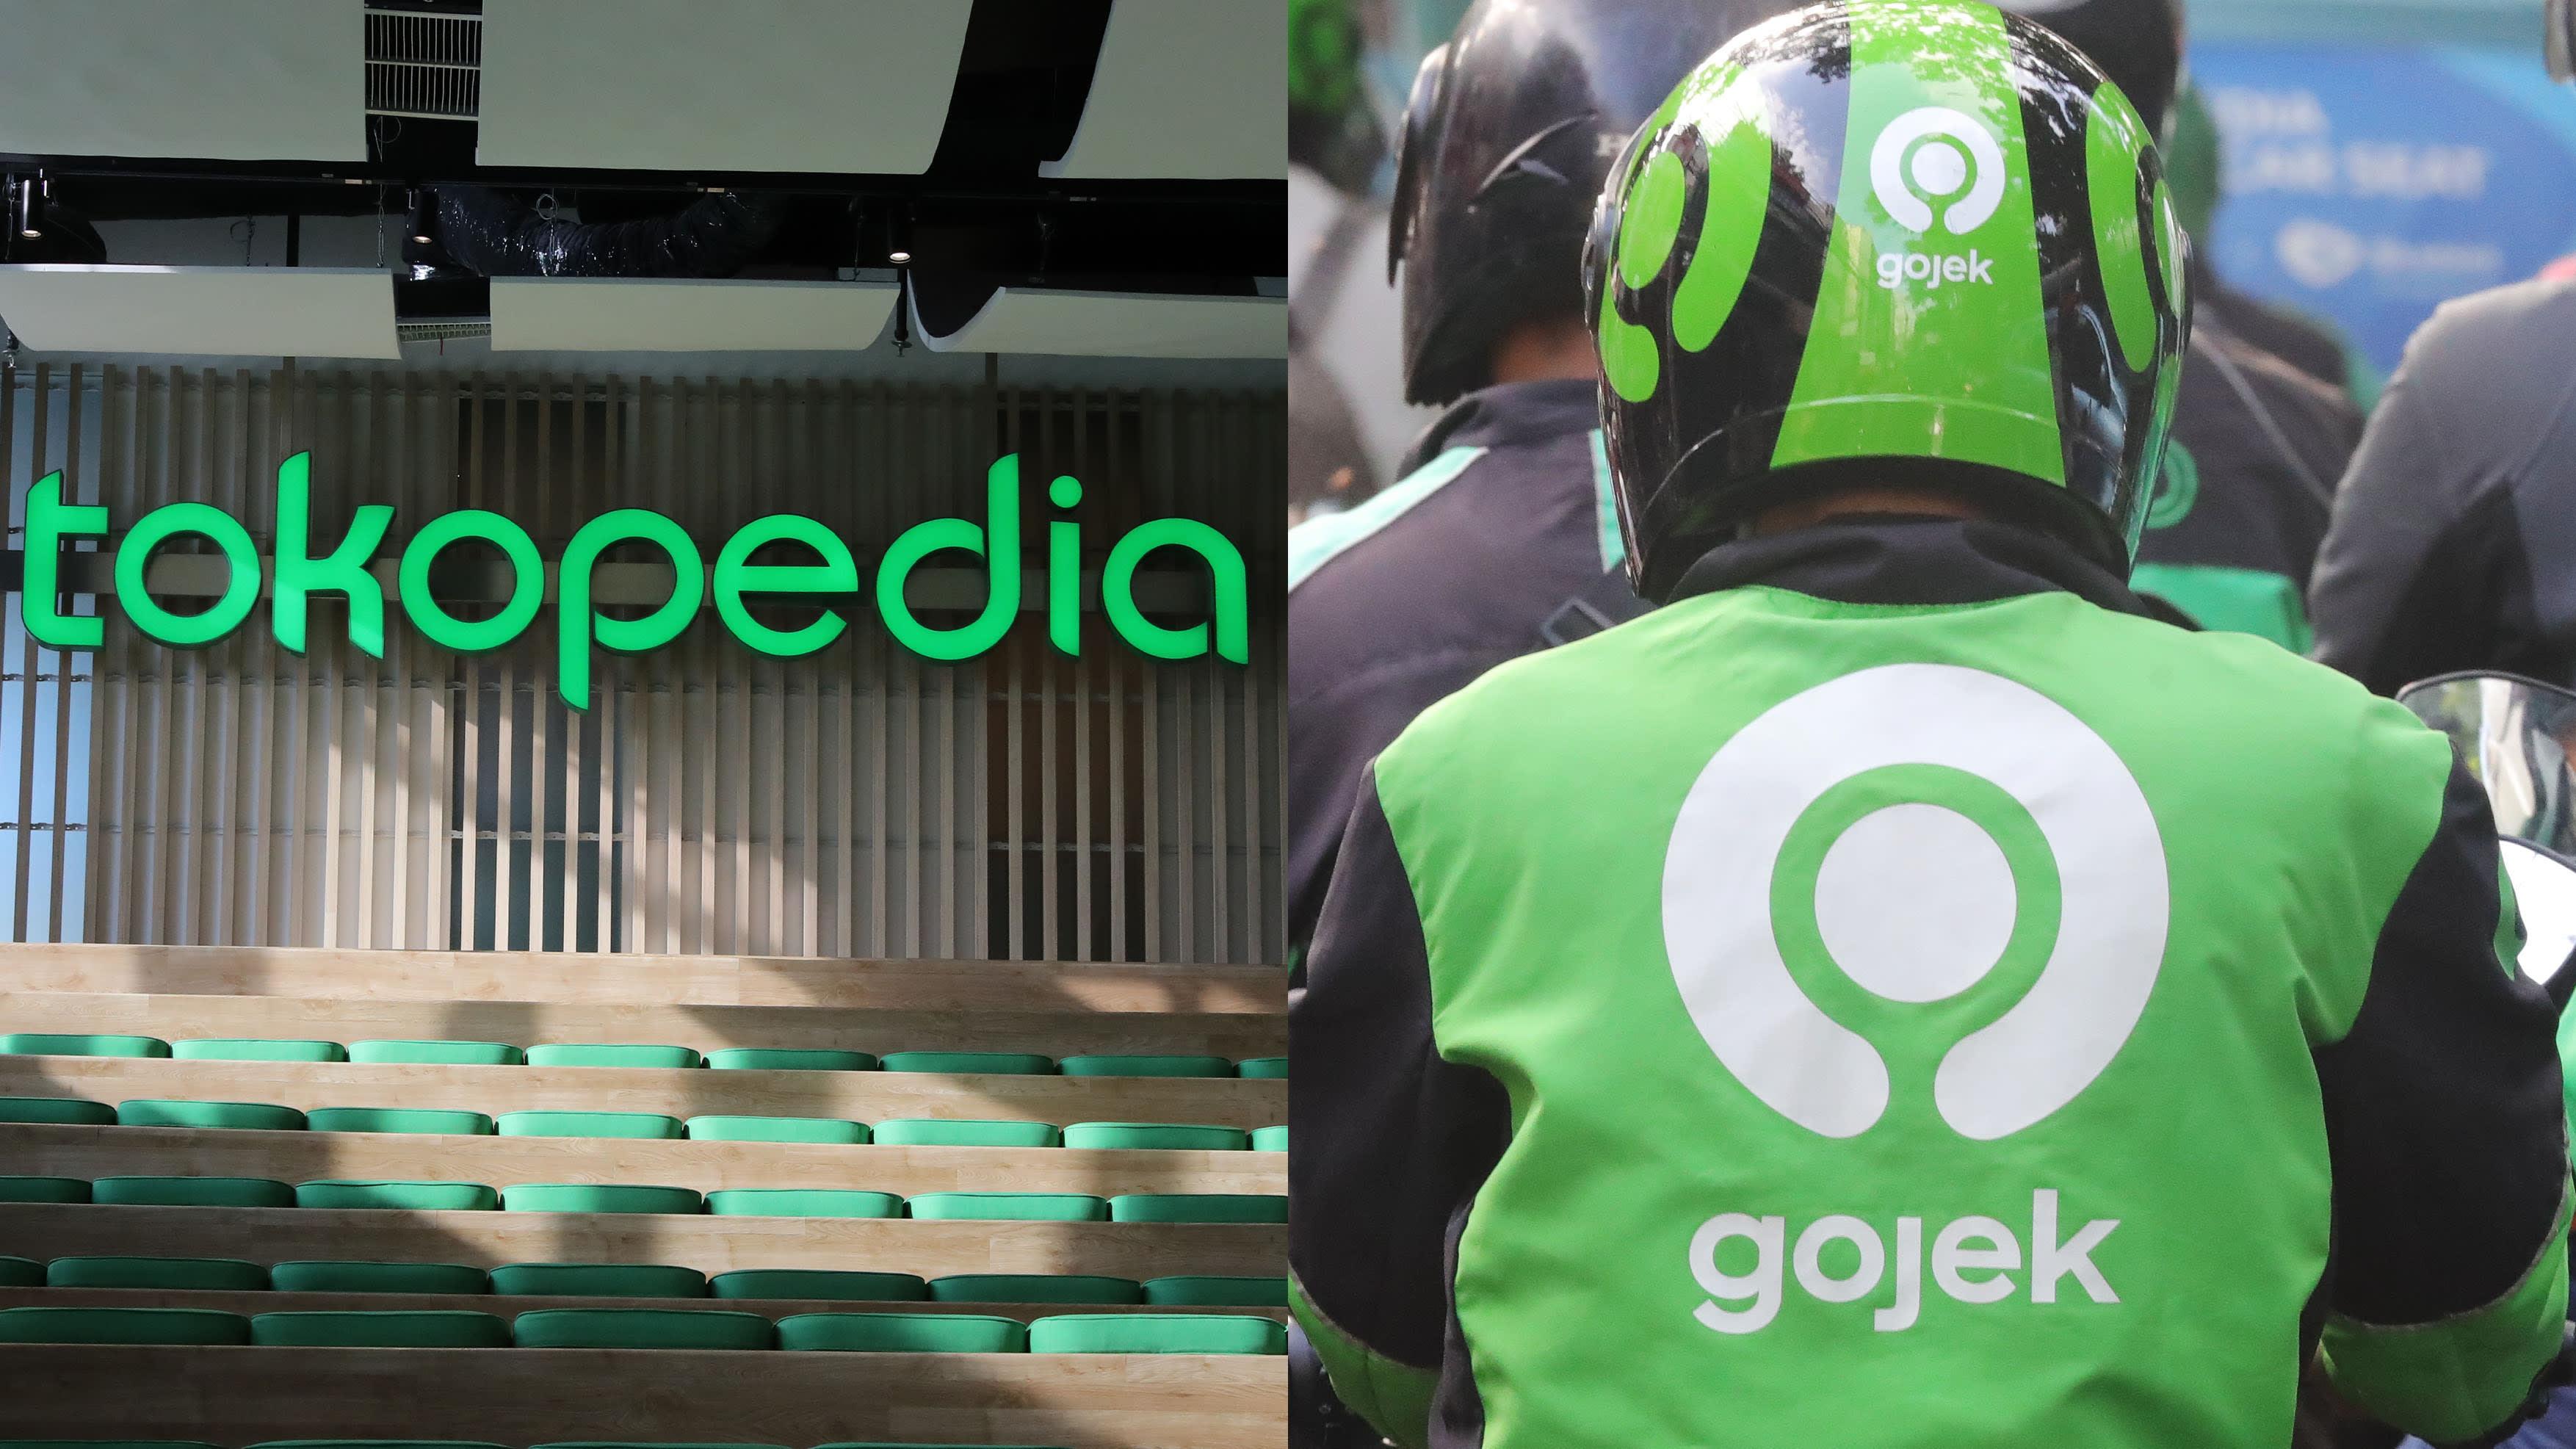 indonesias-gojek-in-merger-talks-with-tokopedia-to-battle-grab